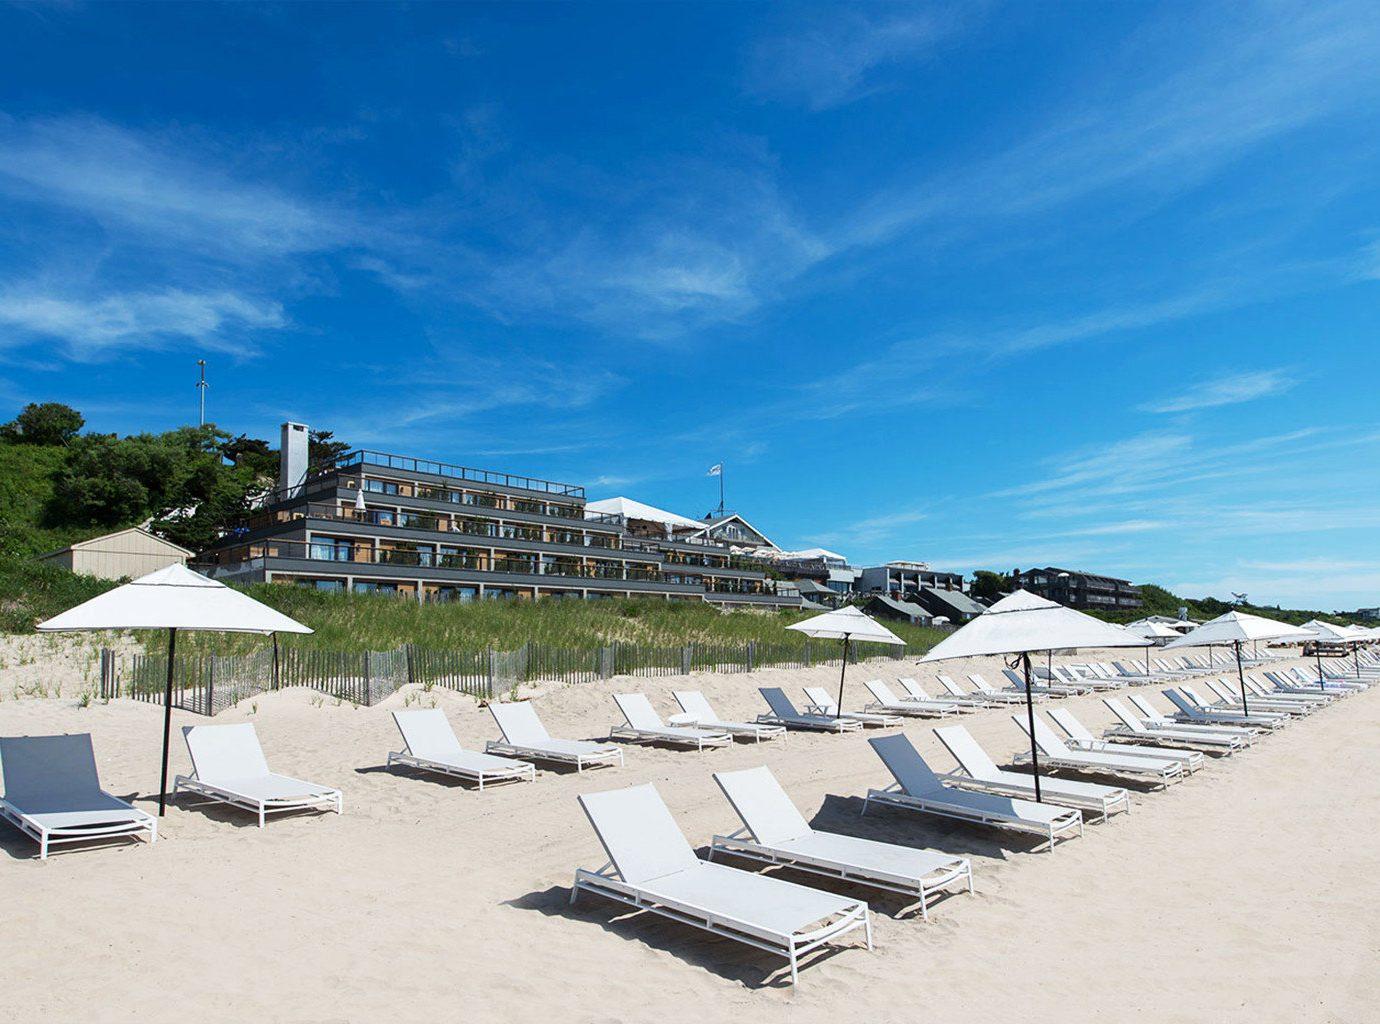 Beach Exterior Hotels Resort outdoor sky umbrella chair Sea Coast vacation shore Ocean lawn walkway bay dock marina boardwalk cape day sandy sunny lined shade several